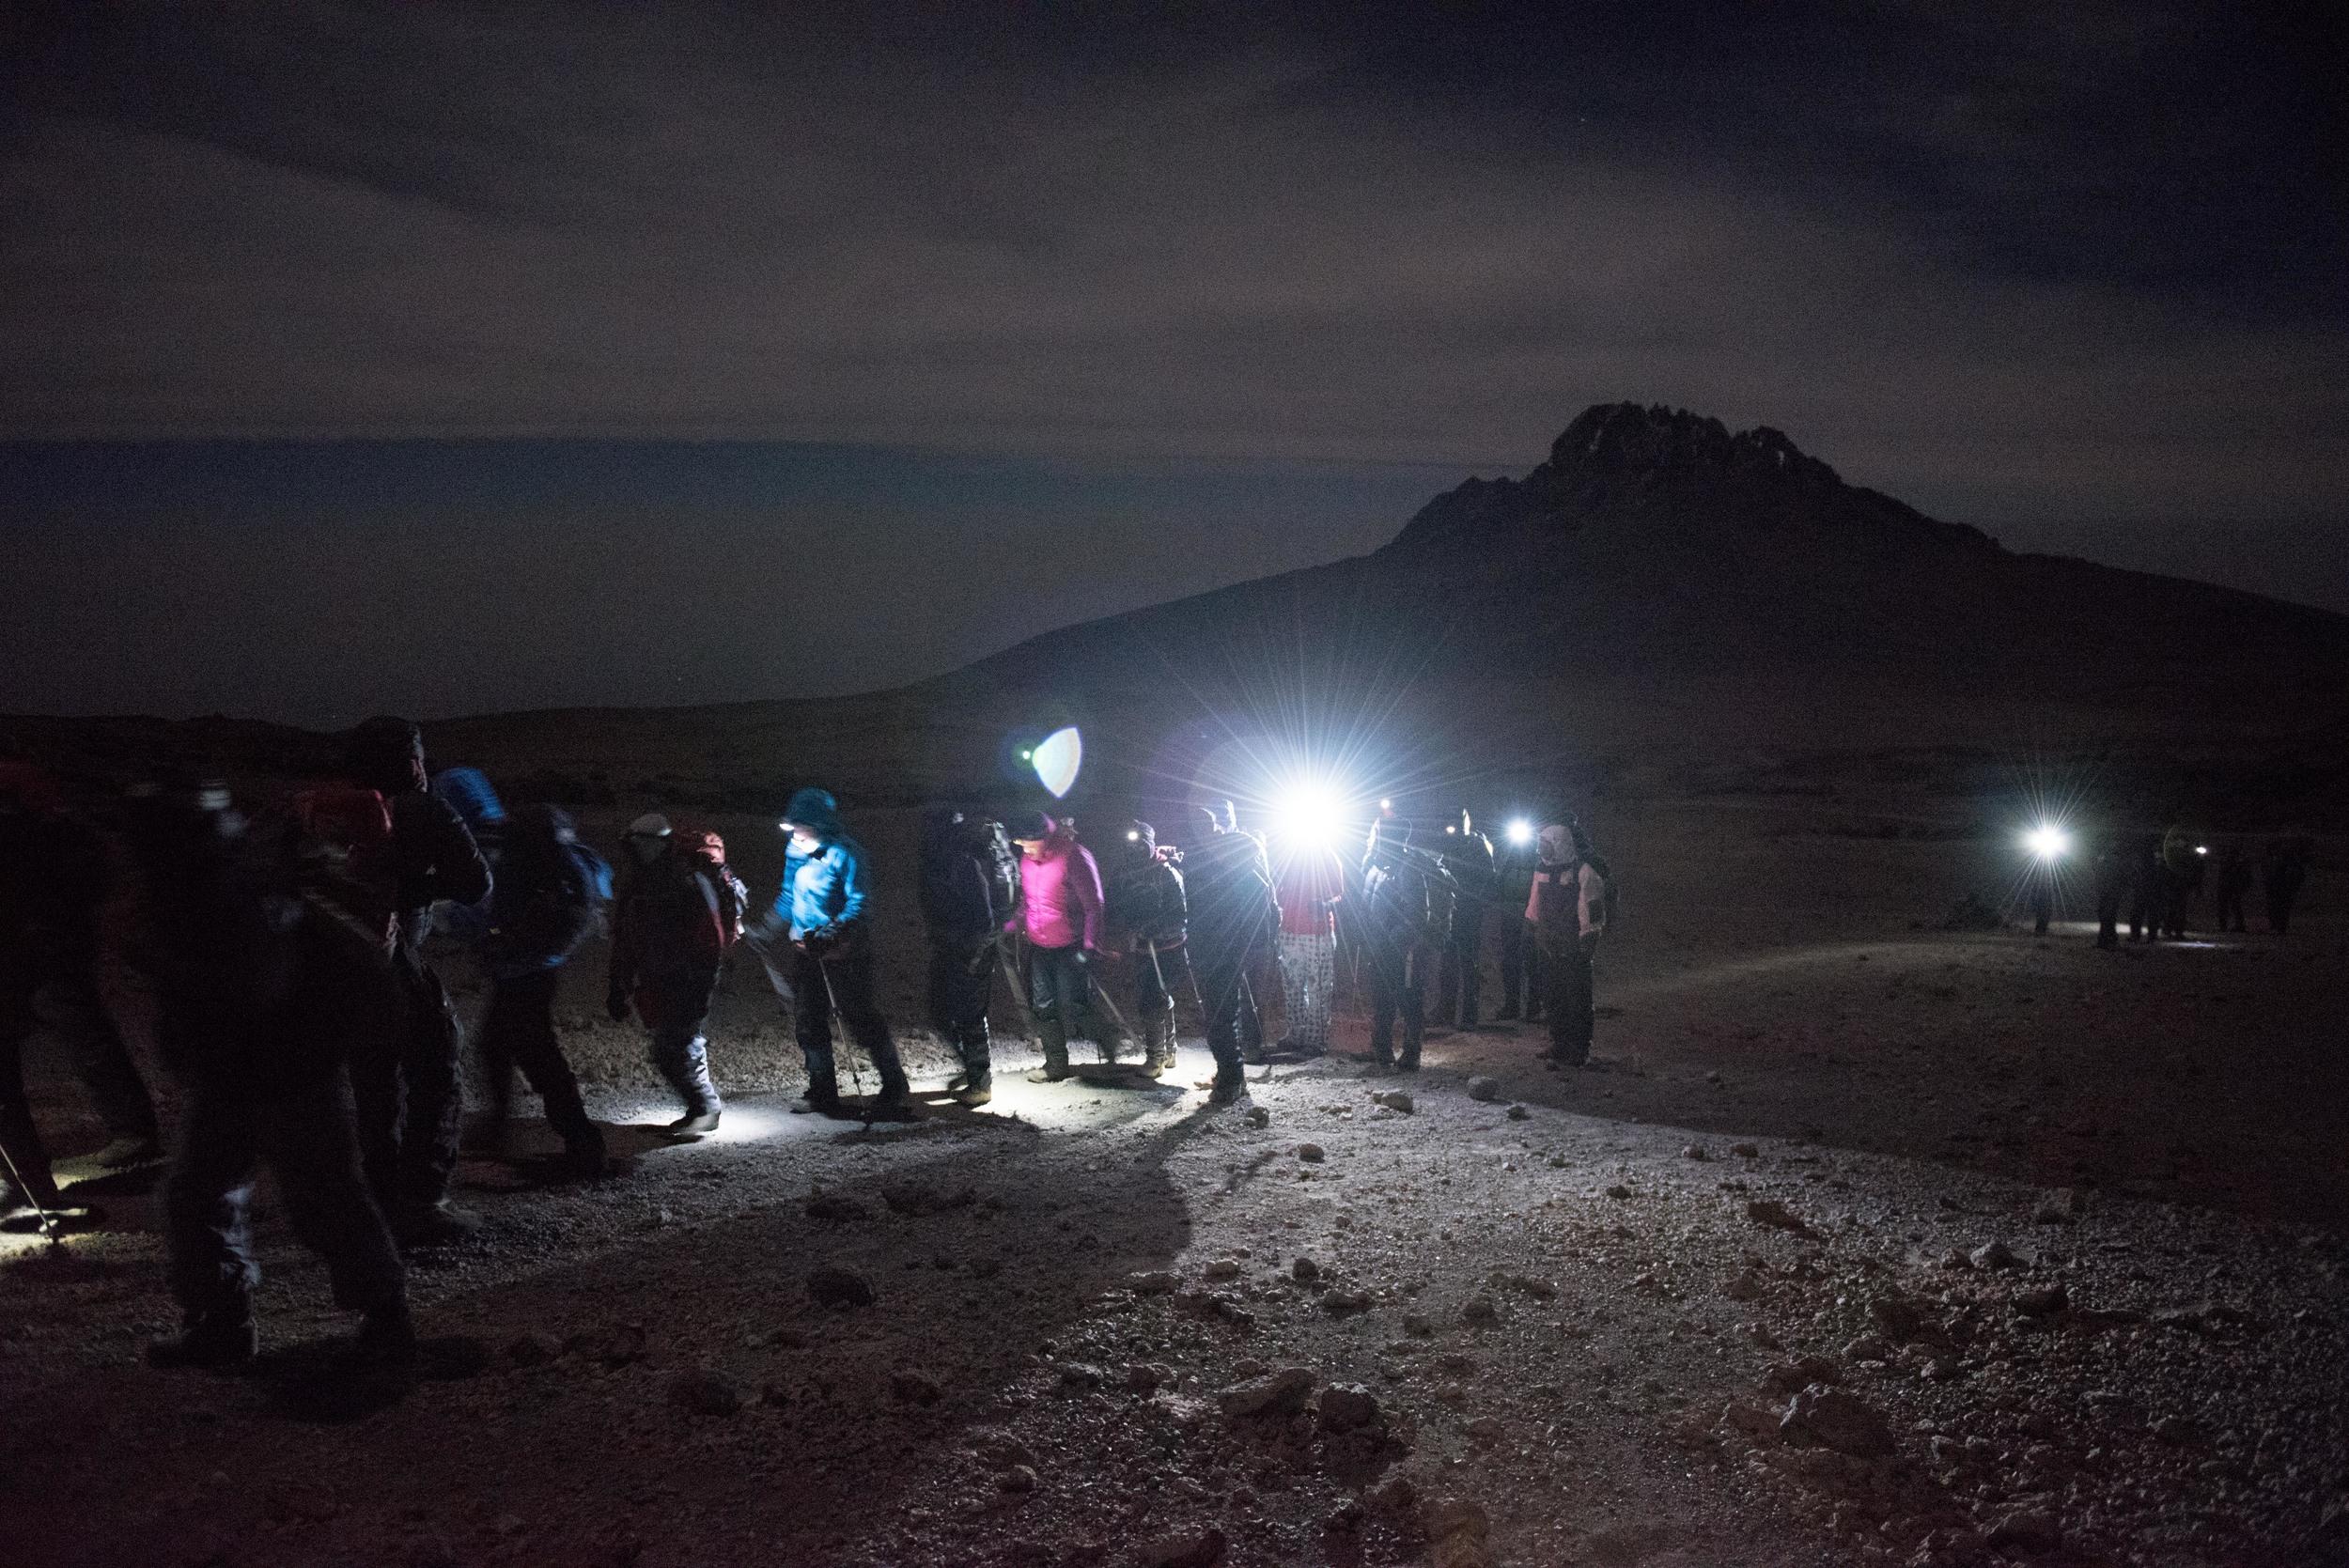 WEB_Kilimanjaro-27.jpg